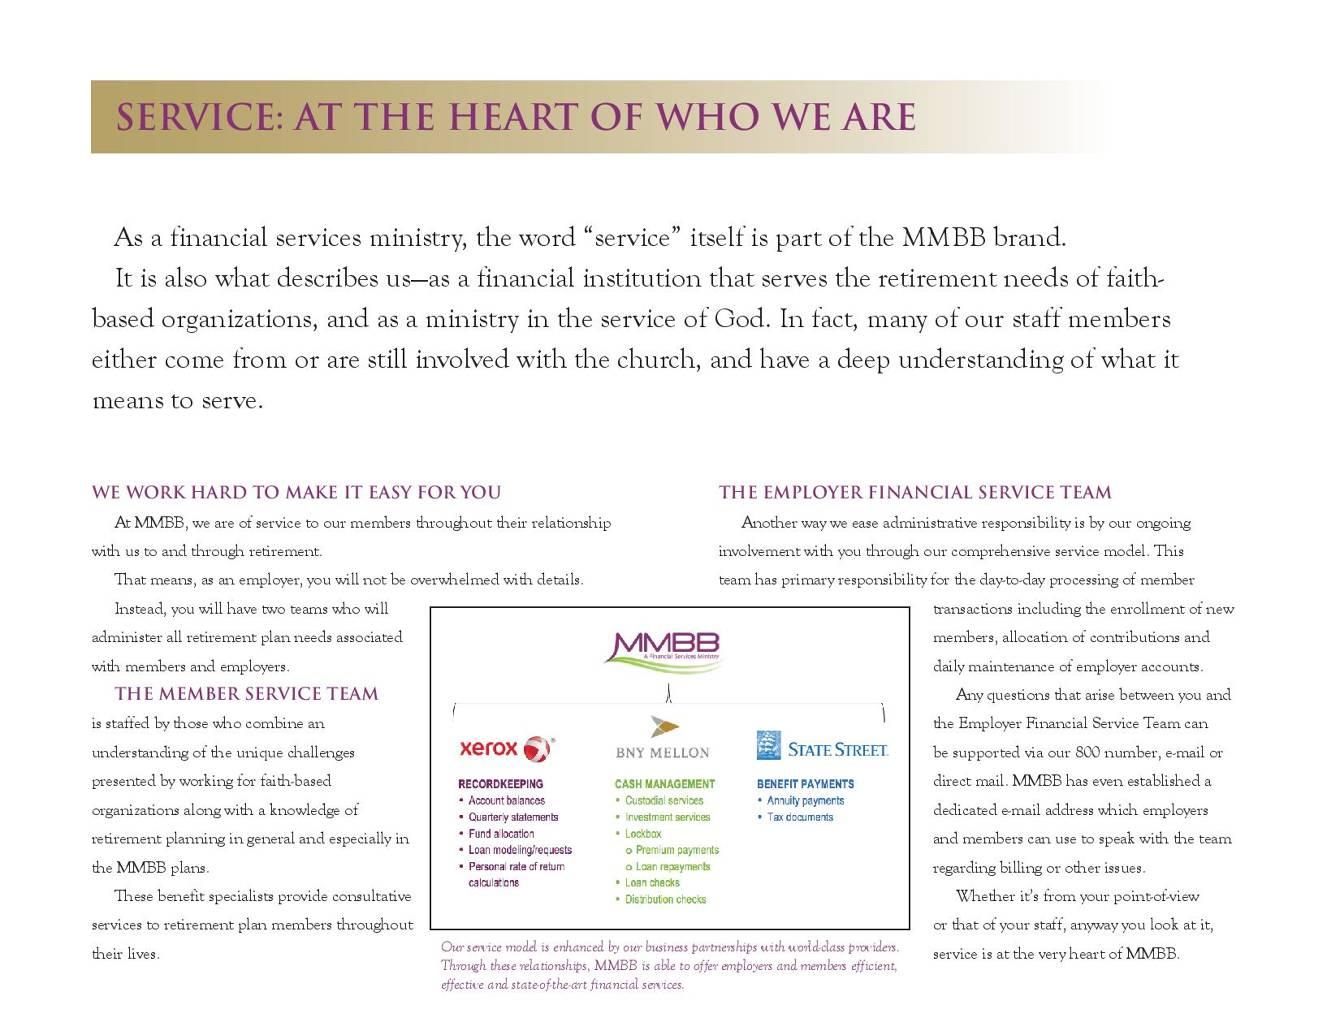 MMBB-Executive-Brochure-page-11_2x.jpg